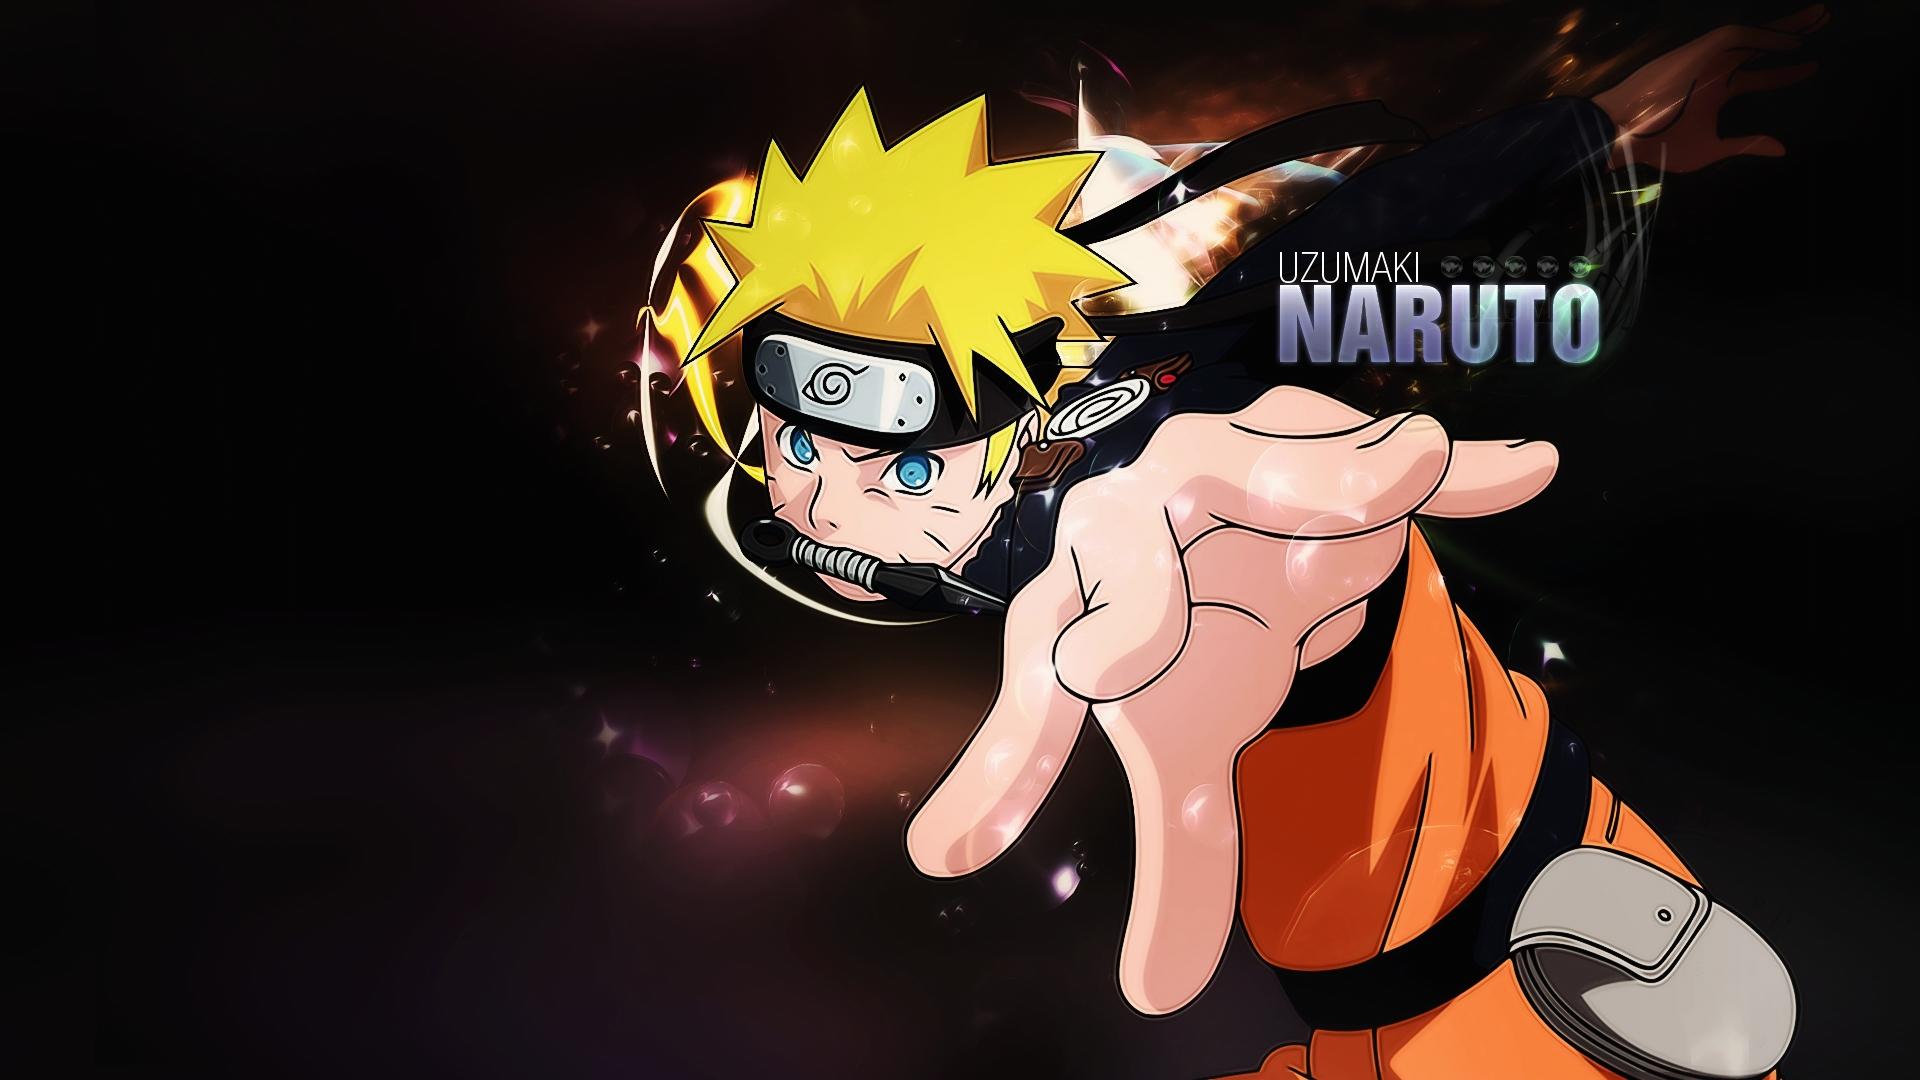 Naruto Shippuden Wallpapers HD Wallpaper of Anime   hdwallpaper2013 1920x1080